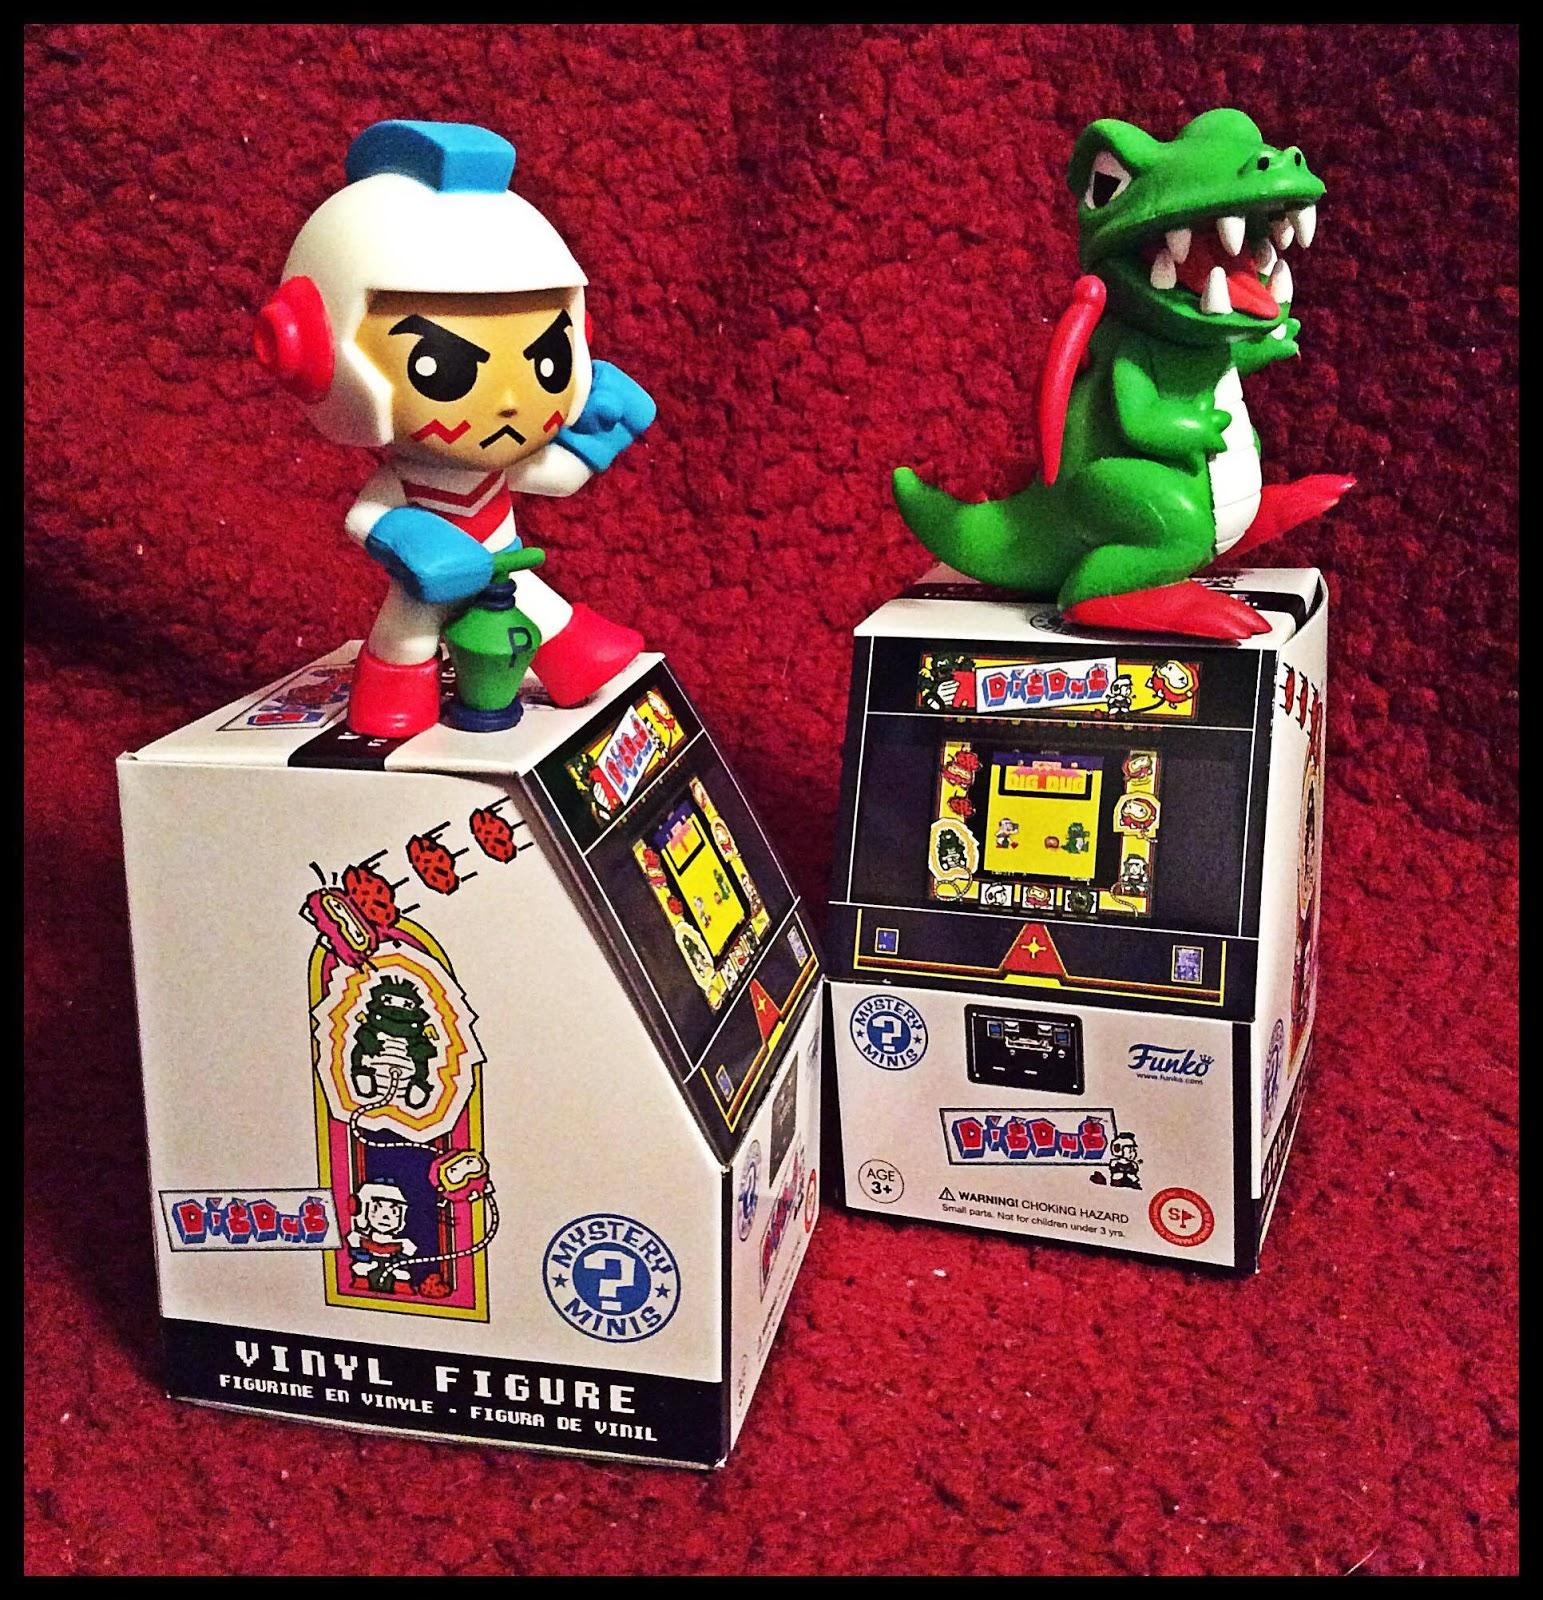 The Terrible Toyman : Funko Retro Video Games Mystery Minis